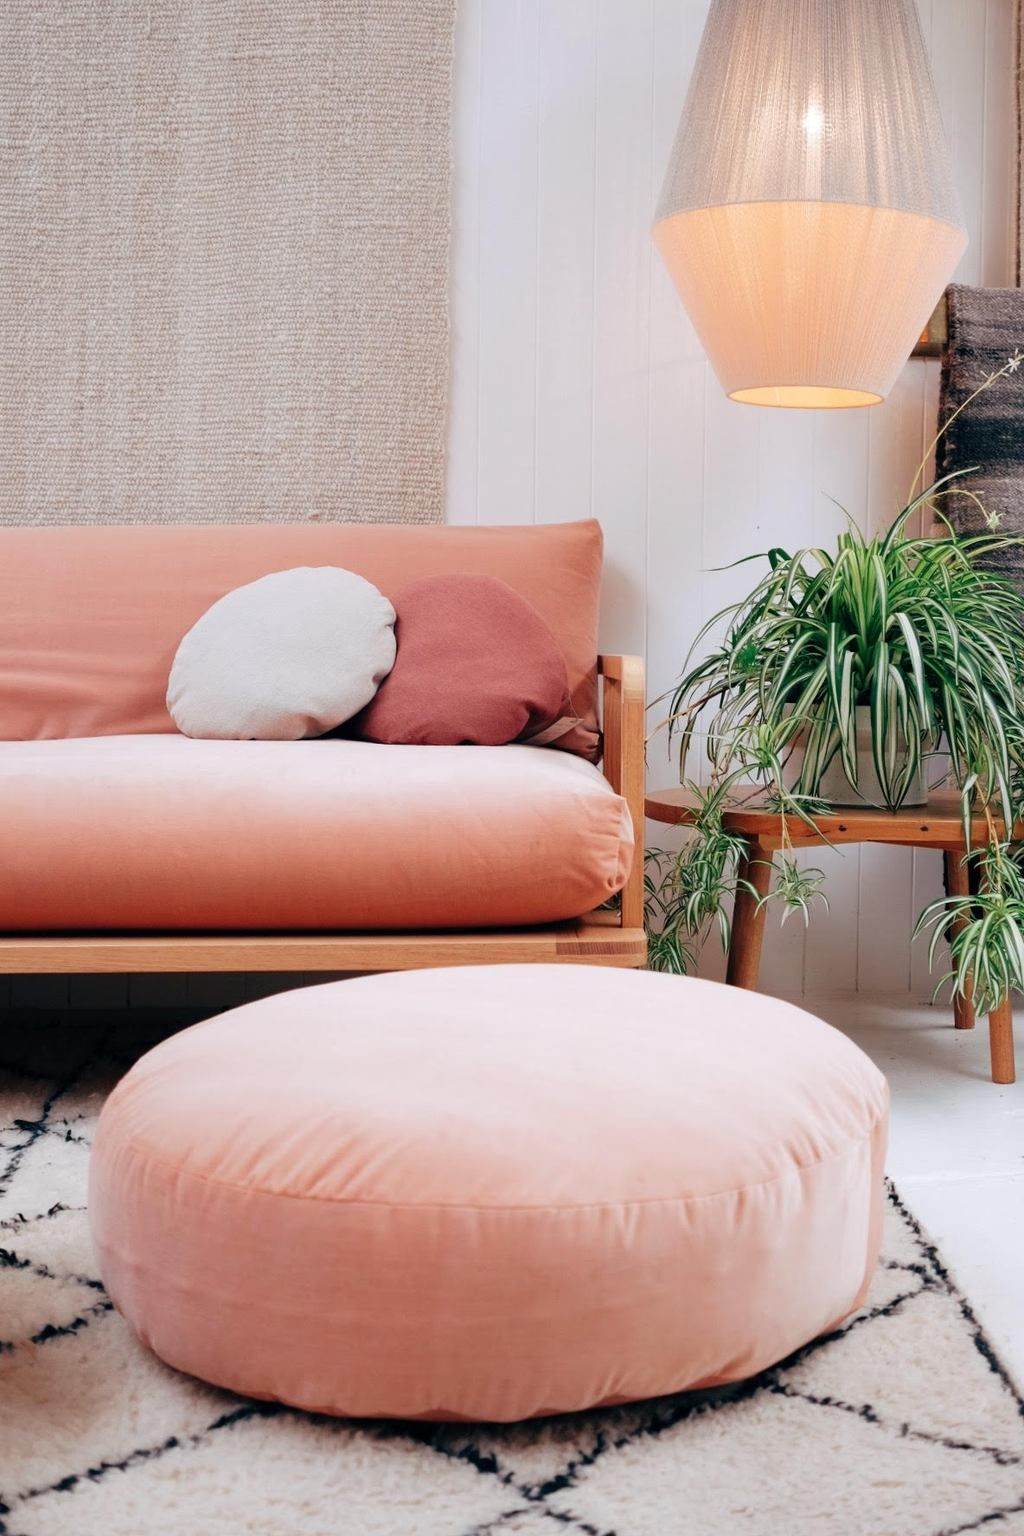 FLOOR CUSHION Velvet in 2020 Floor cushions, Boho